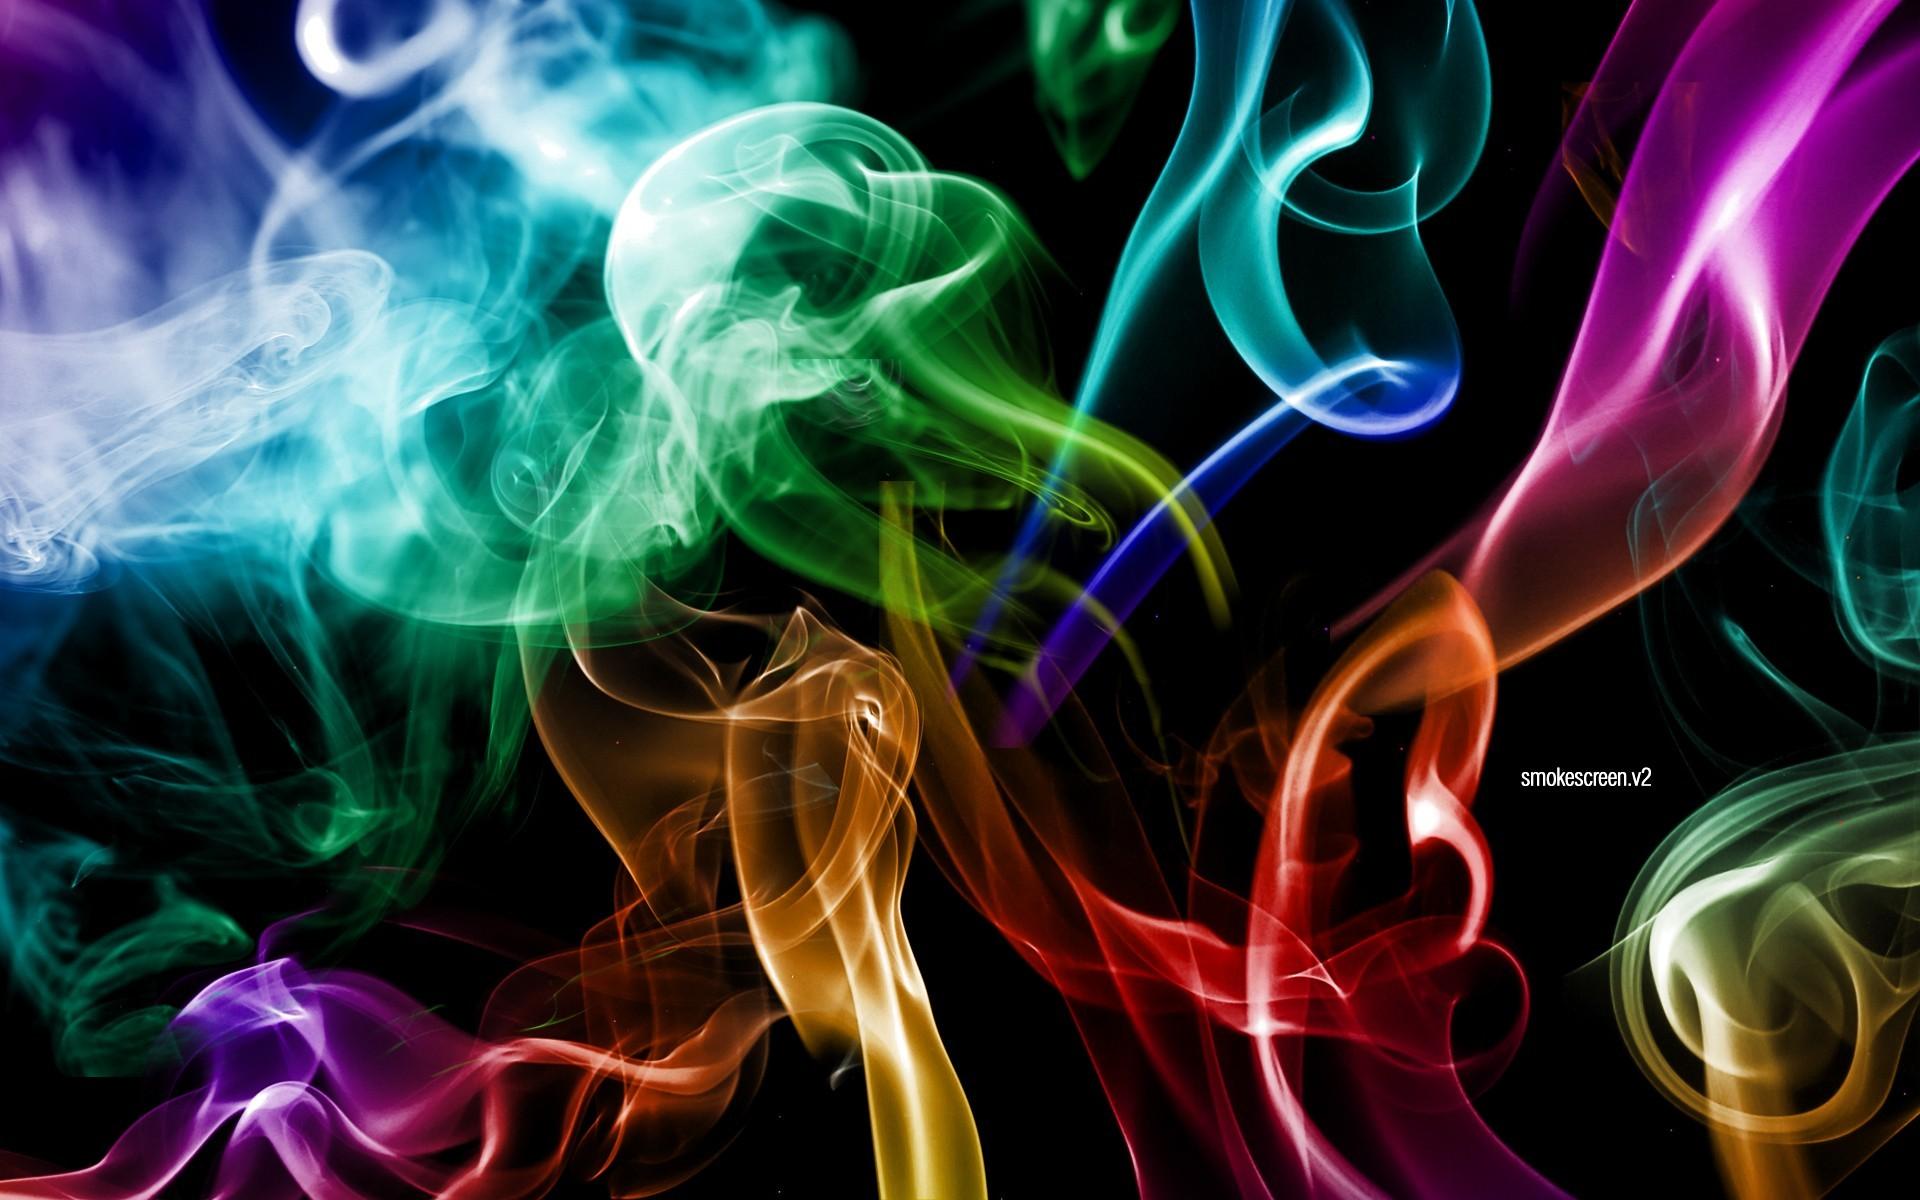 Smoke Colors Wallpapers | HD Wallpapers